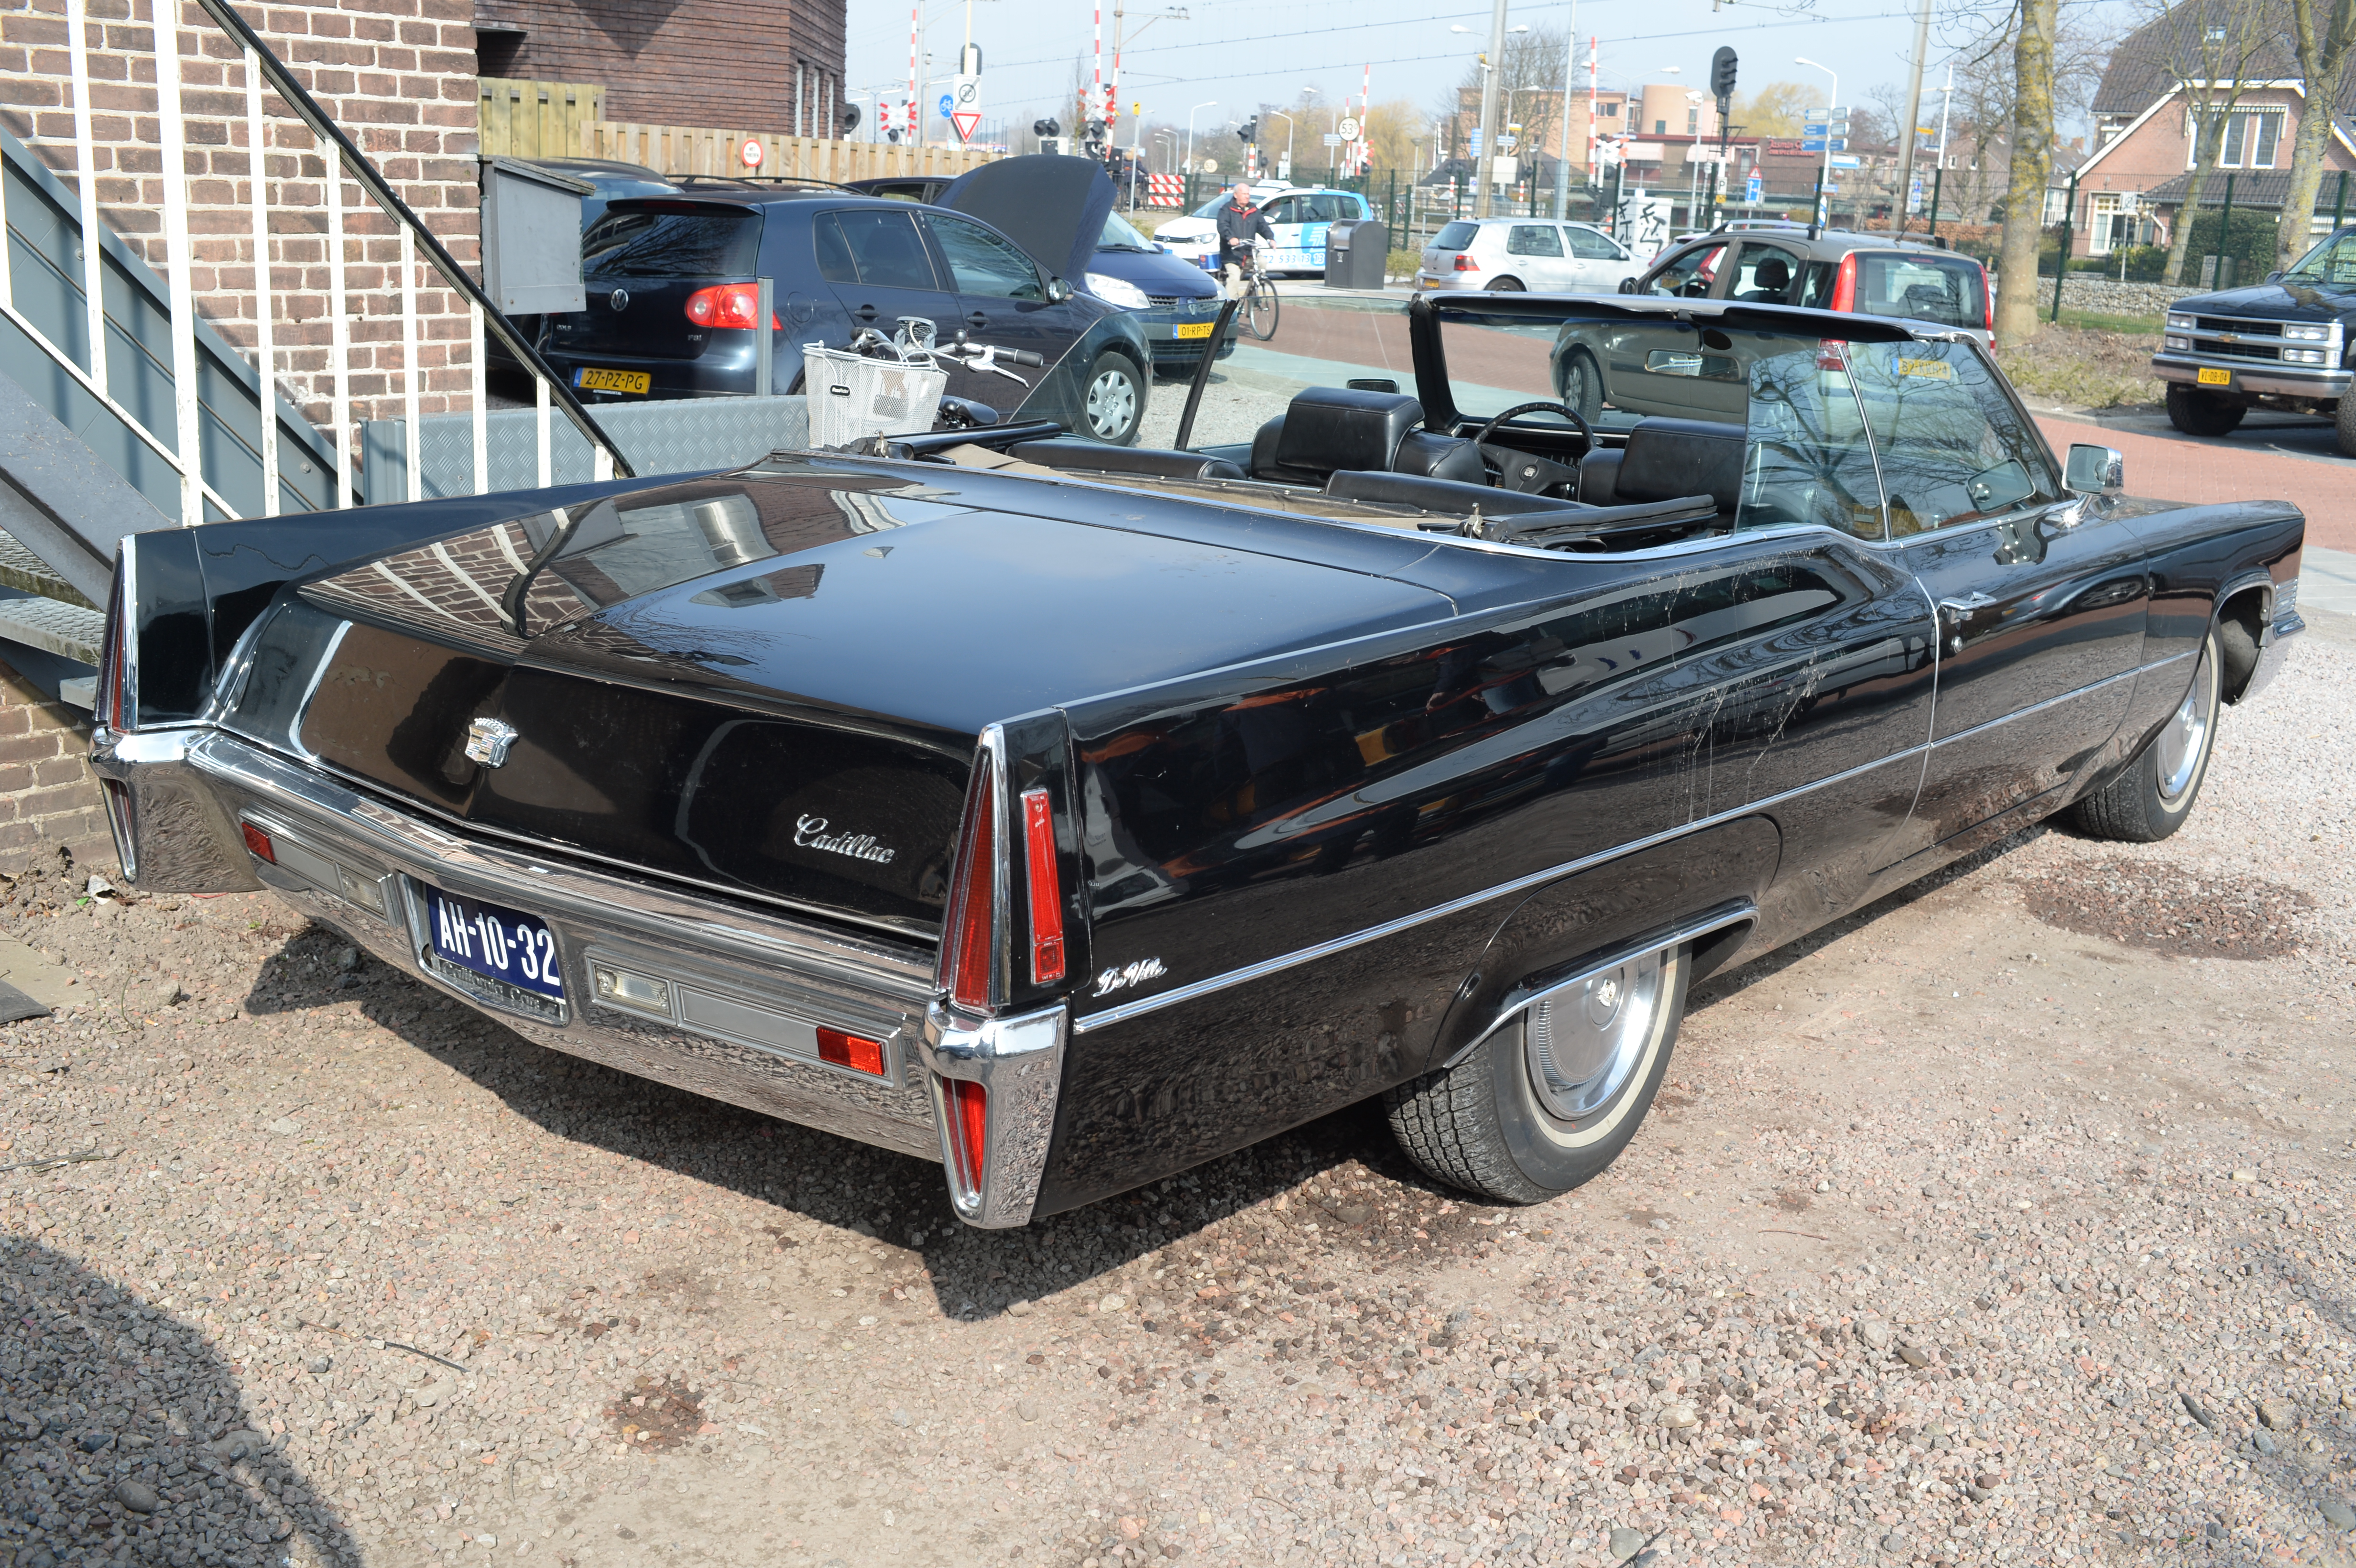 File:1970 Cadillac DeVille convertible (2) jpg - Wikimedia